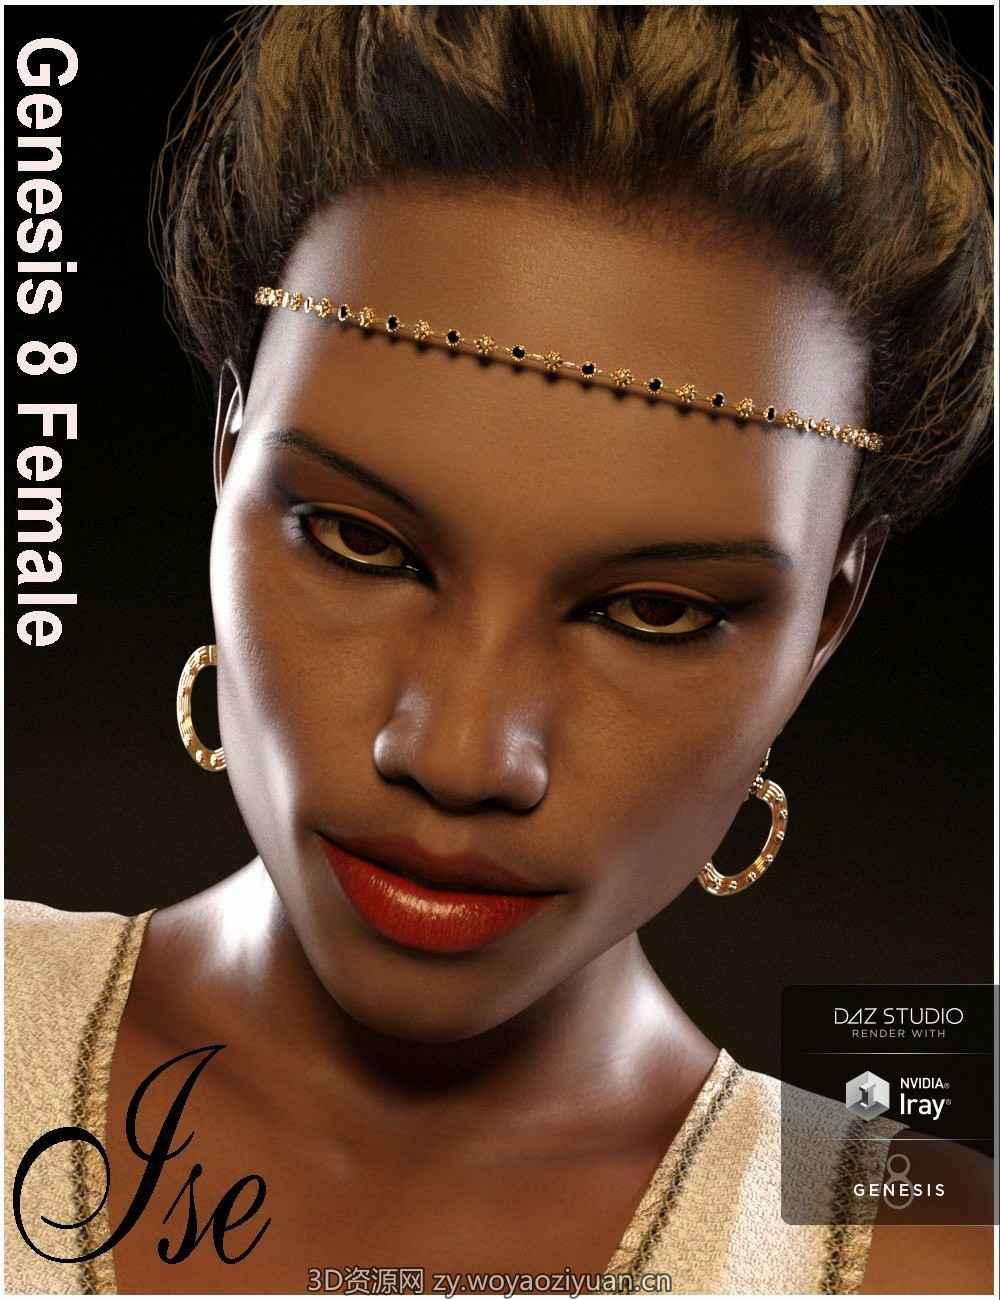 Ise for Genesis 8 Female